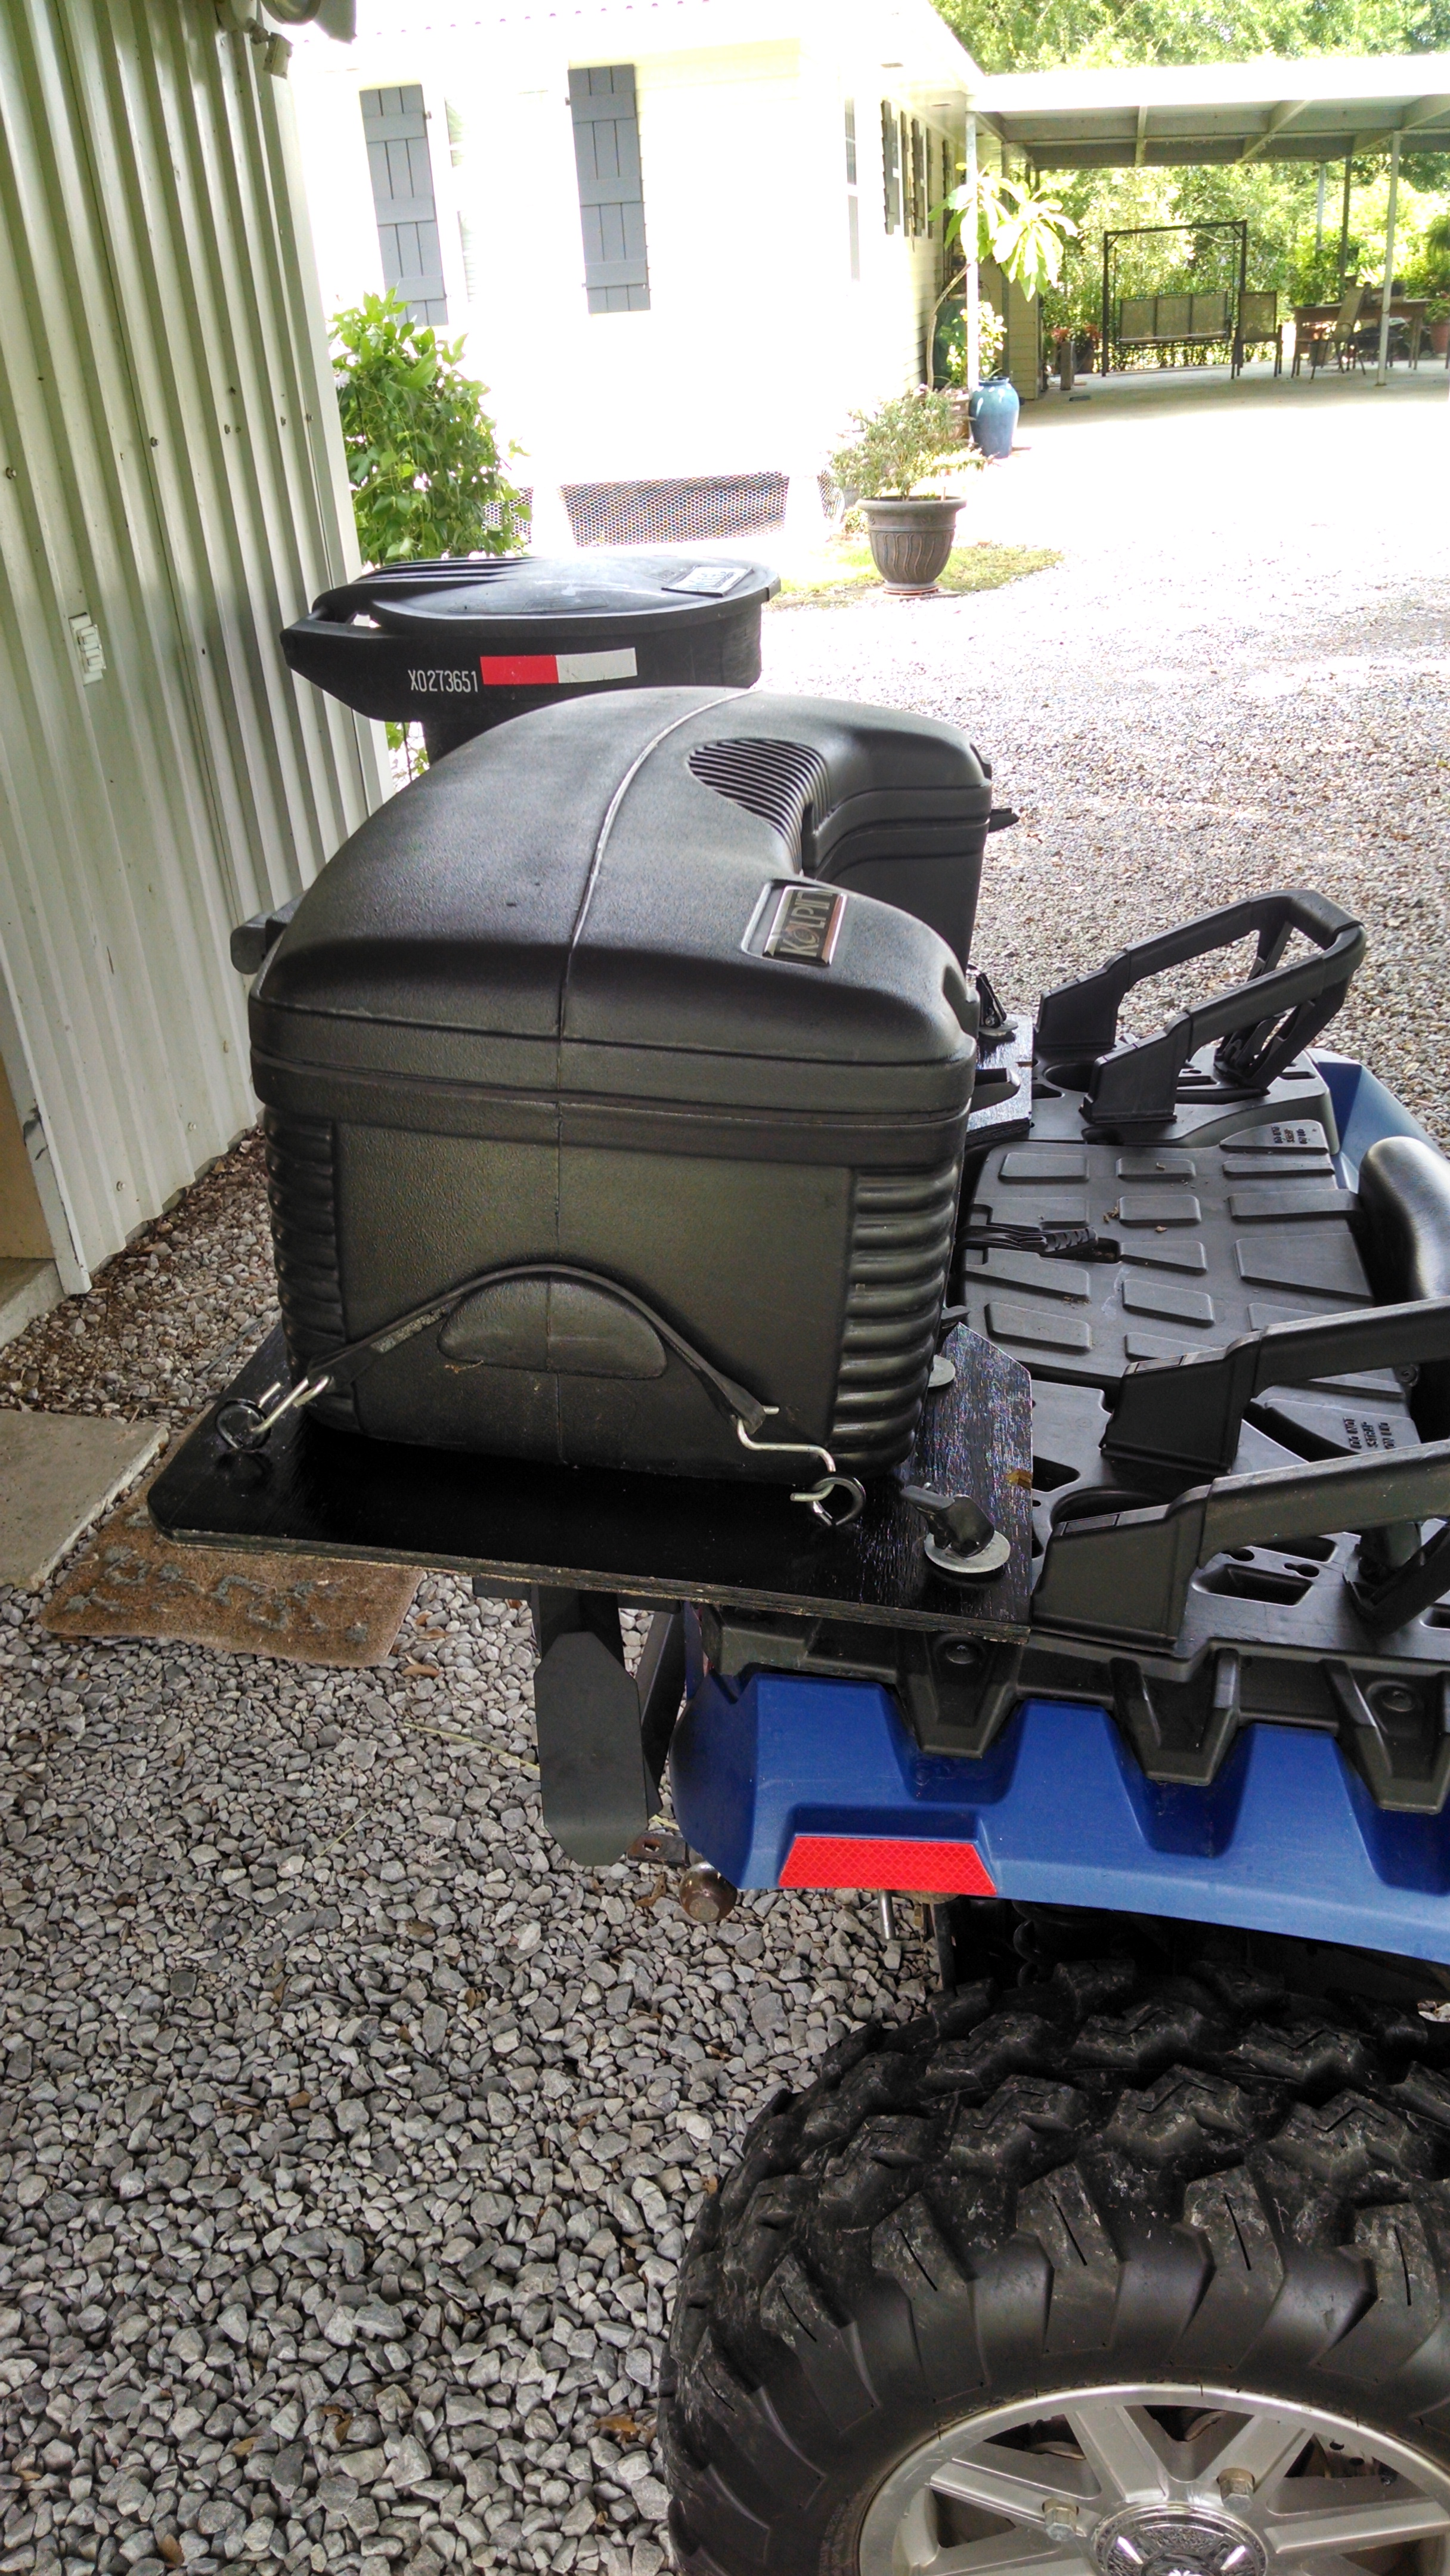 truck itm rear rack vans back bar w guard trucks leader window utility in toyota protector accessories